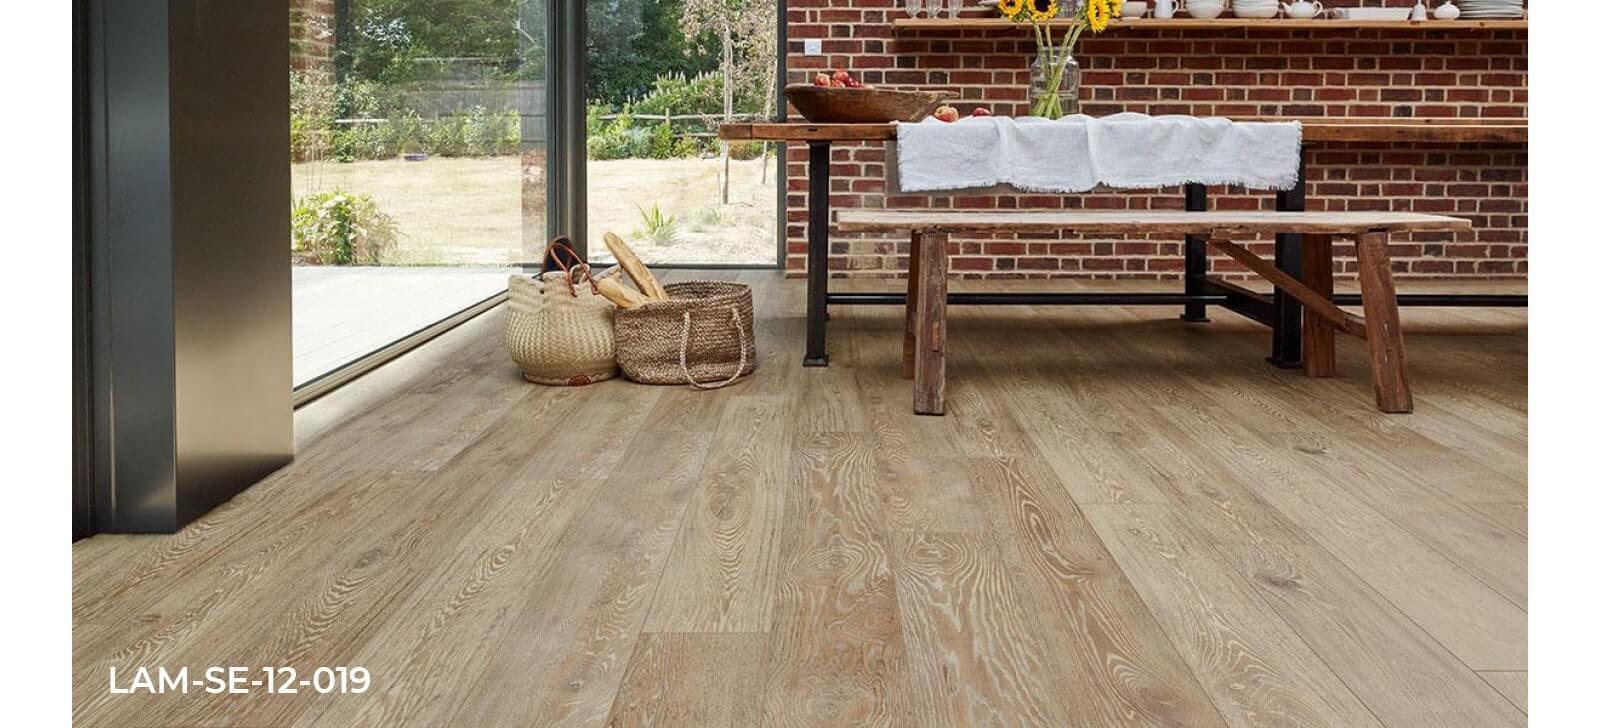 Series Wood Professional Lion Oak laminate flooring dining room roomset